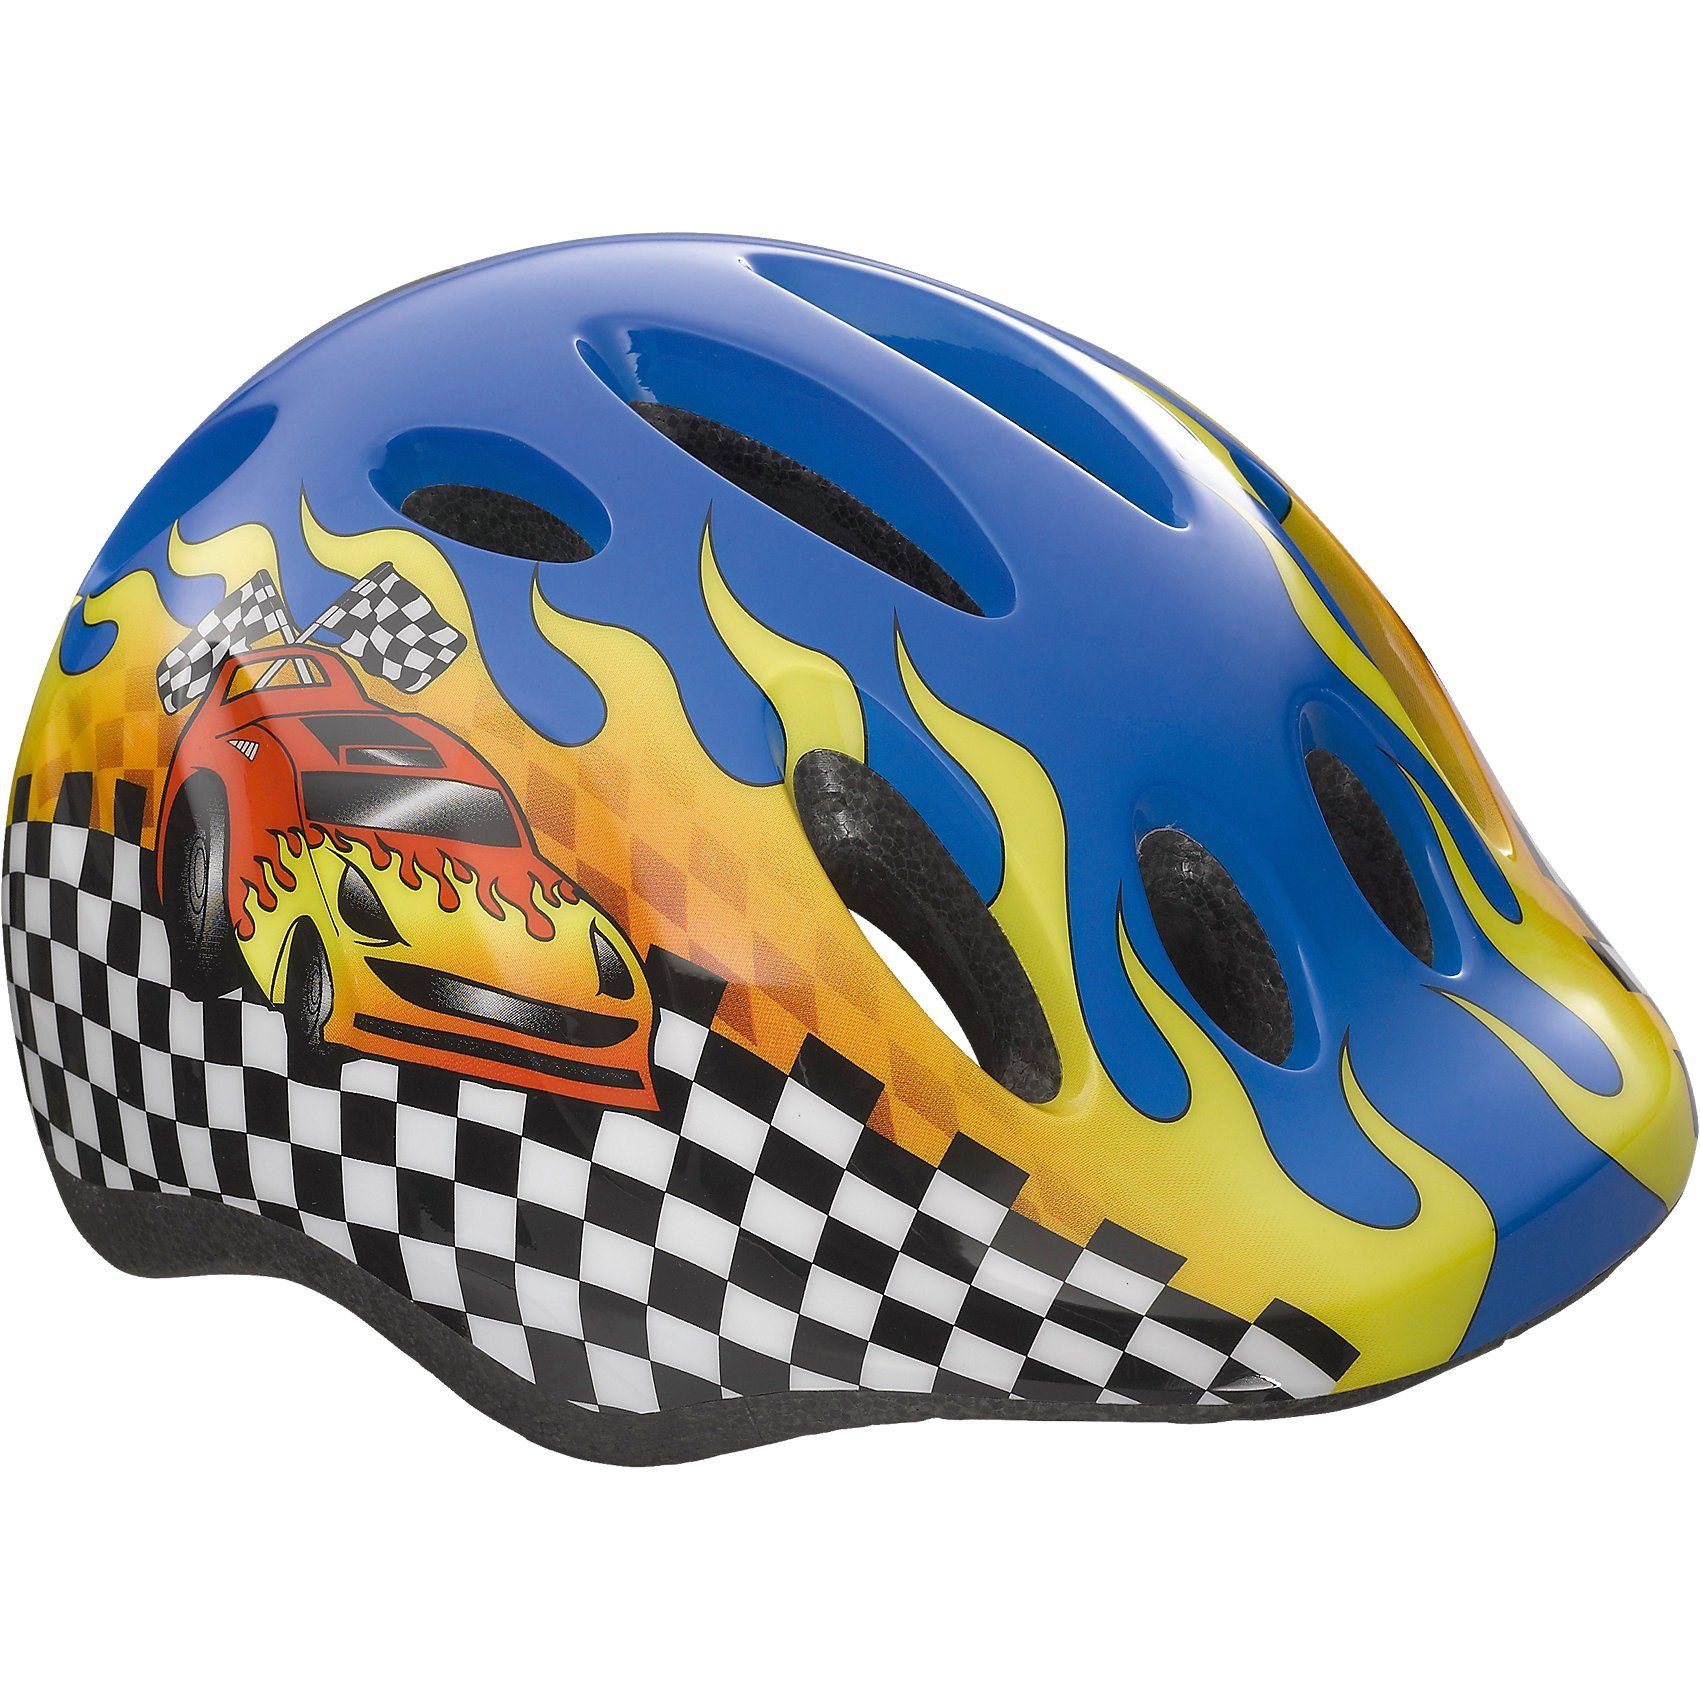 Lazer Fahrradhelm Max+ Auto Gr. 49-56, blau